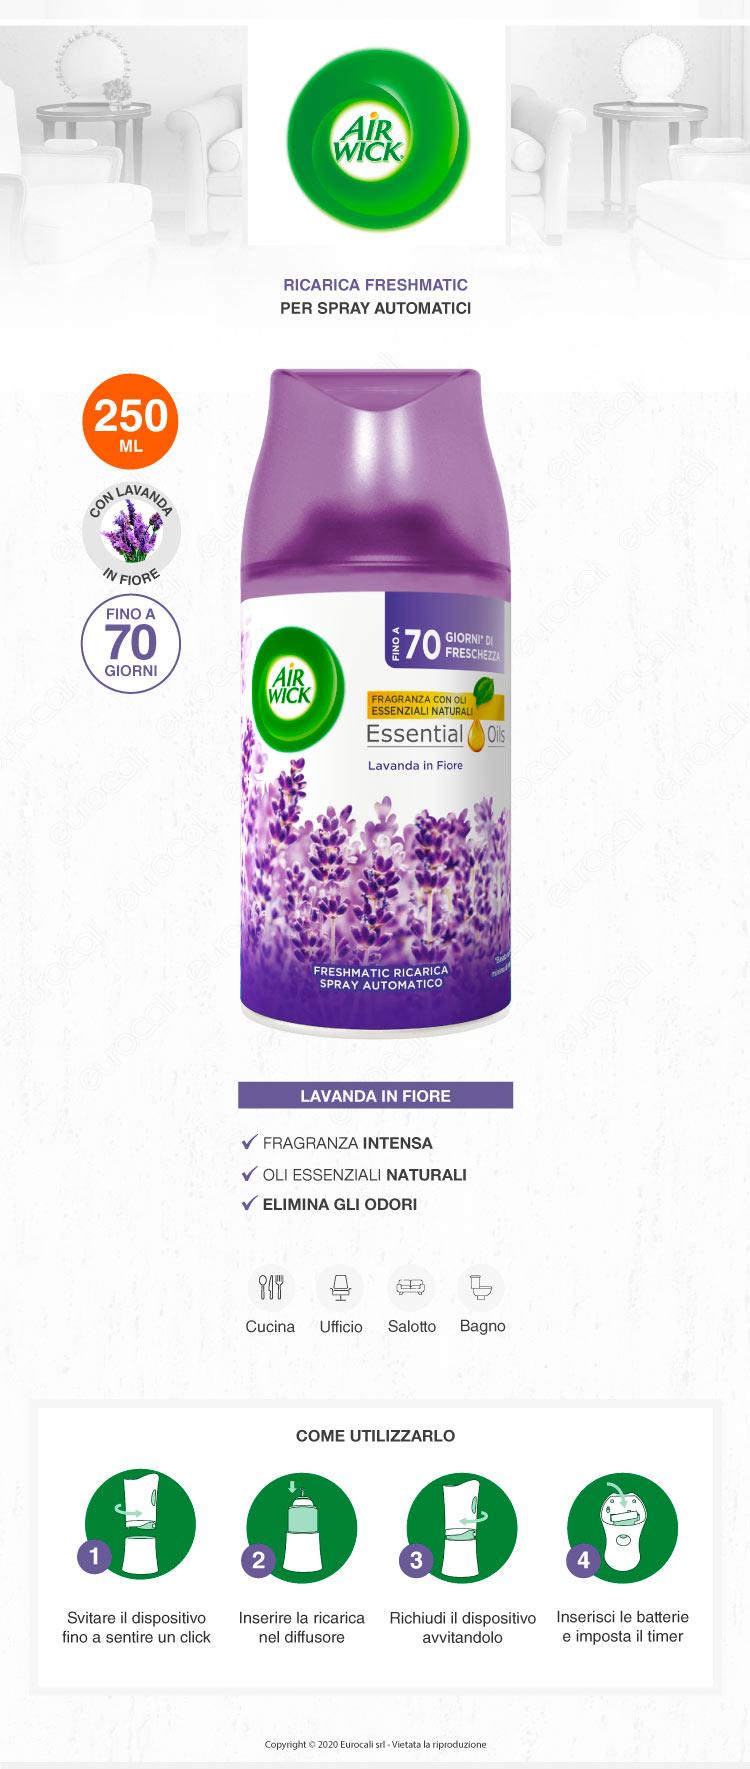 Air Wick Freshmatic Ricarica Spray Profumo Lavanda